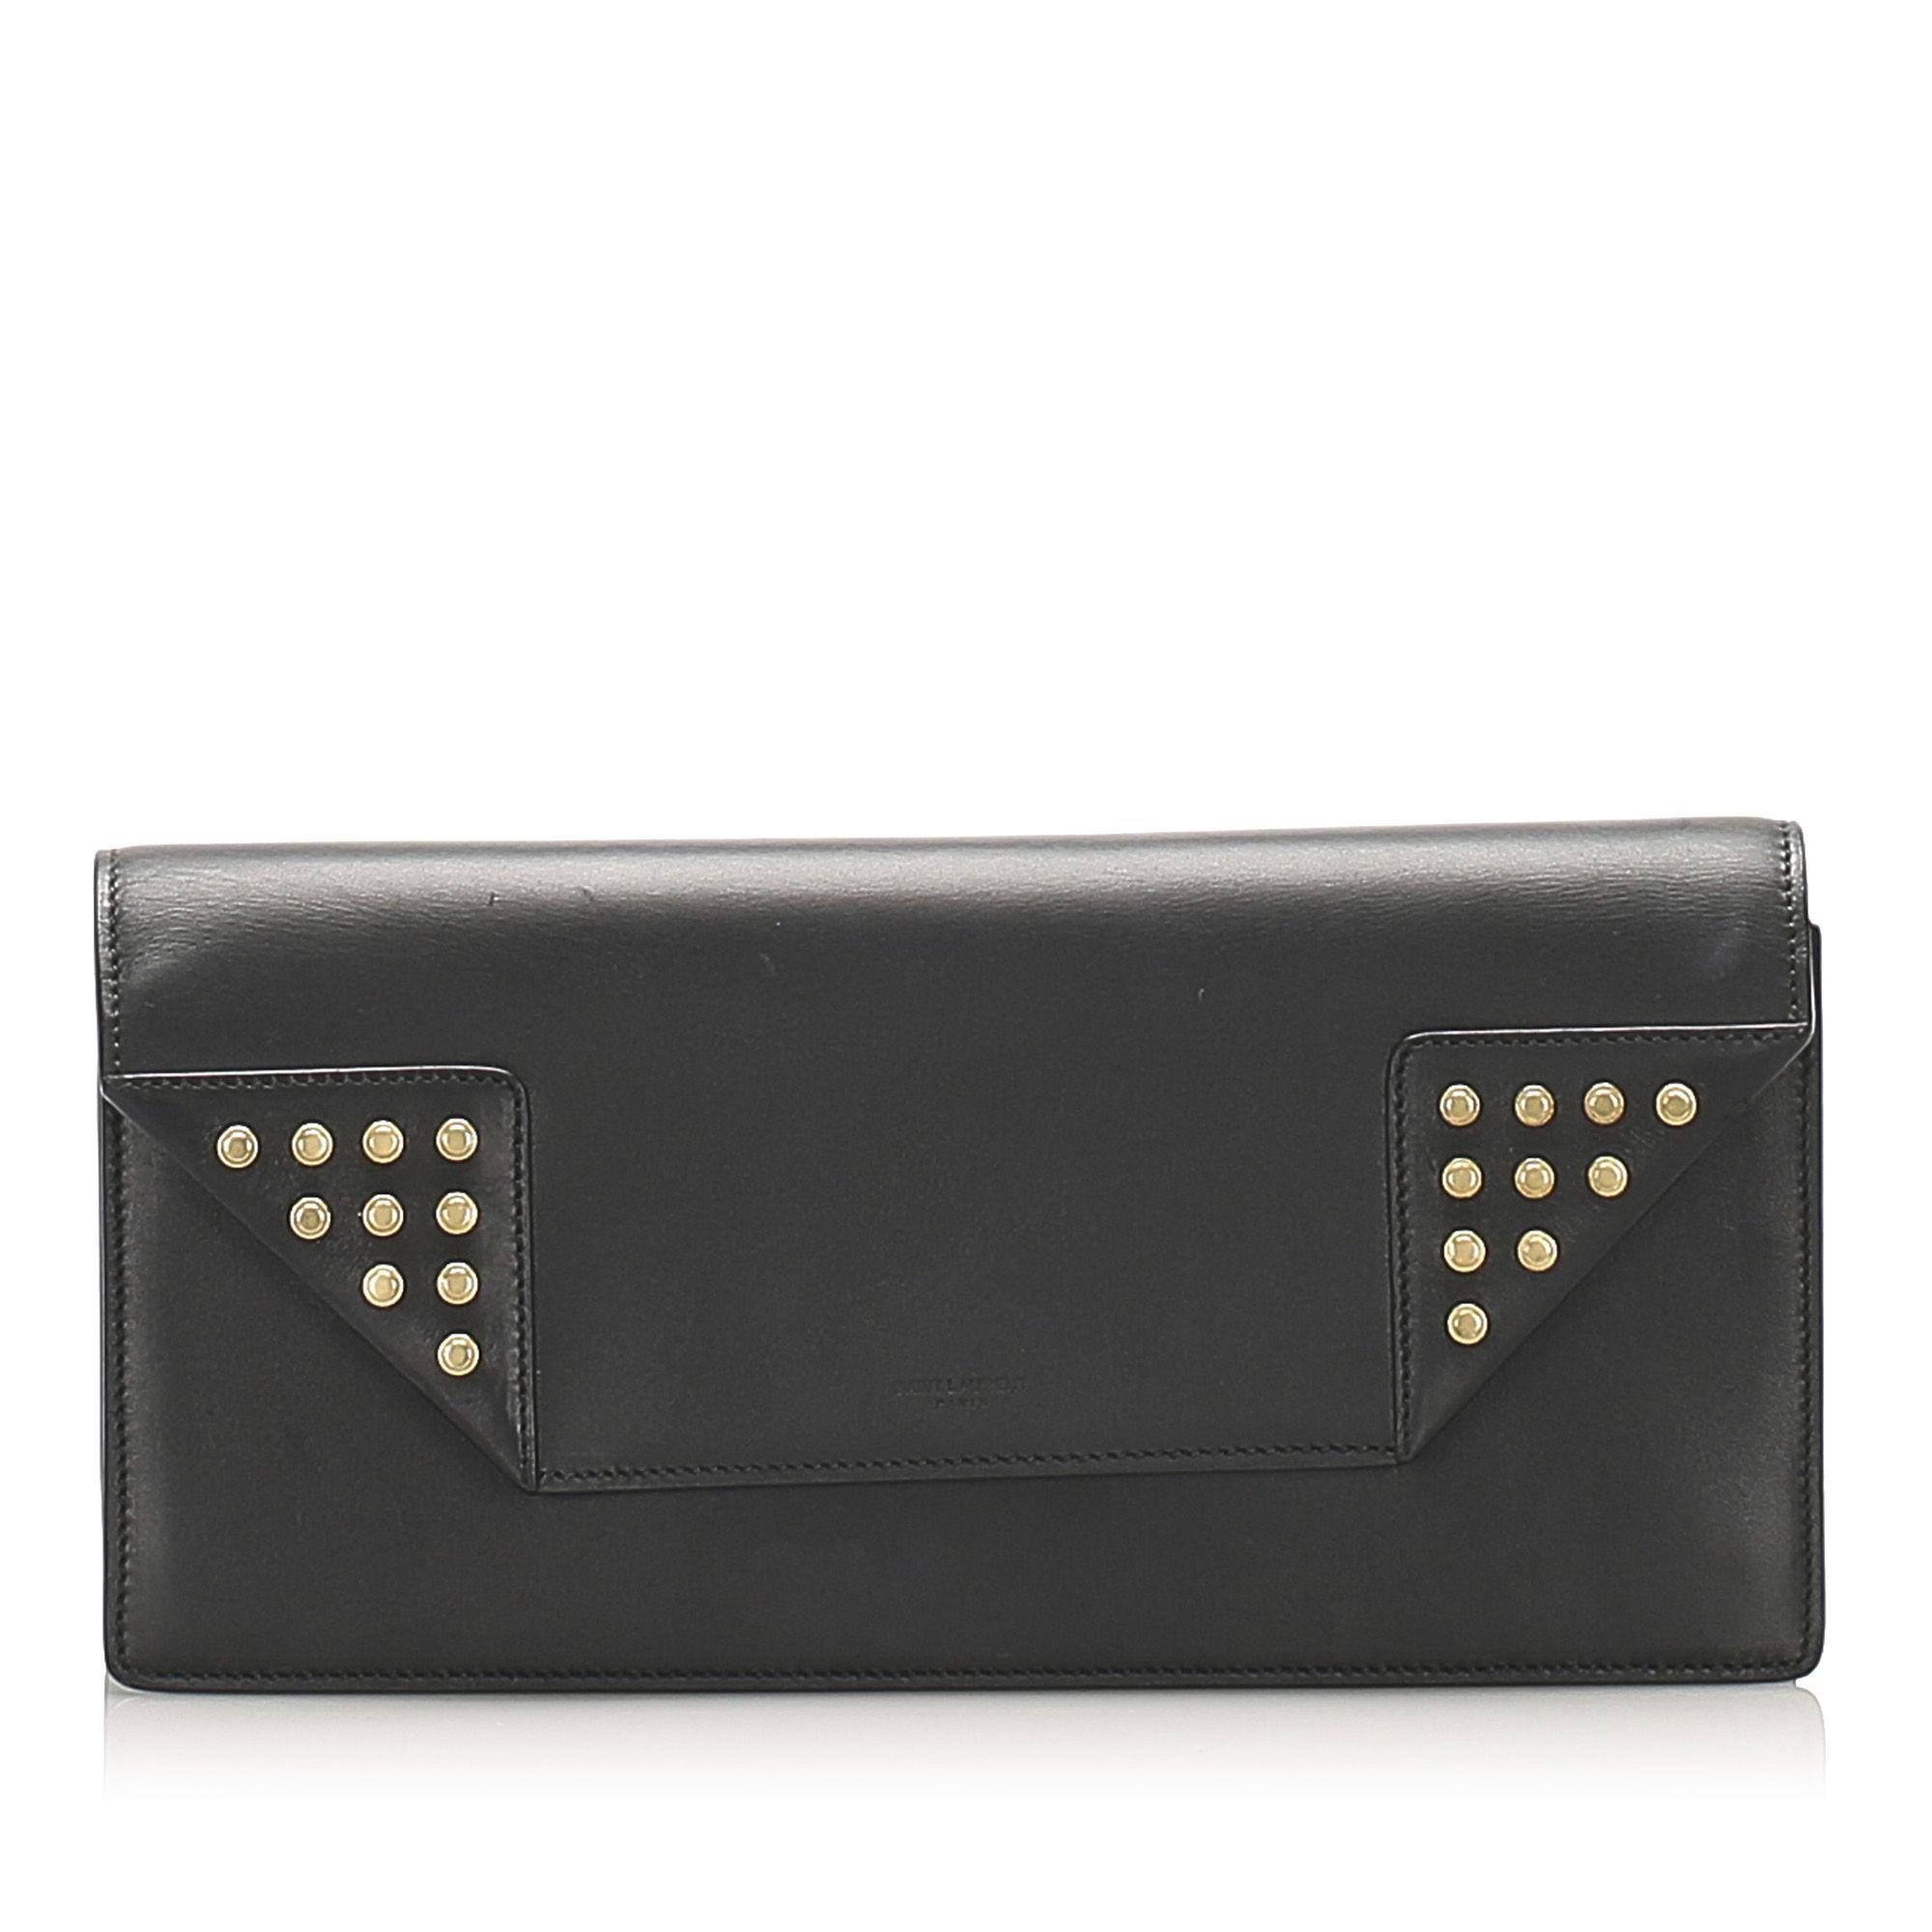 Vintage YSL Betty Leather Clutch Bag Black